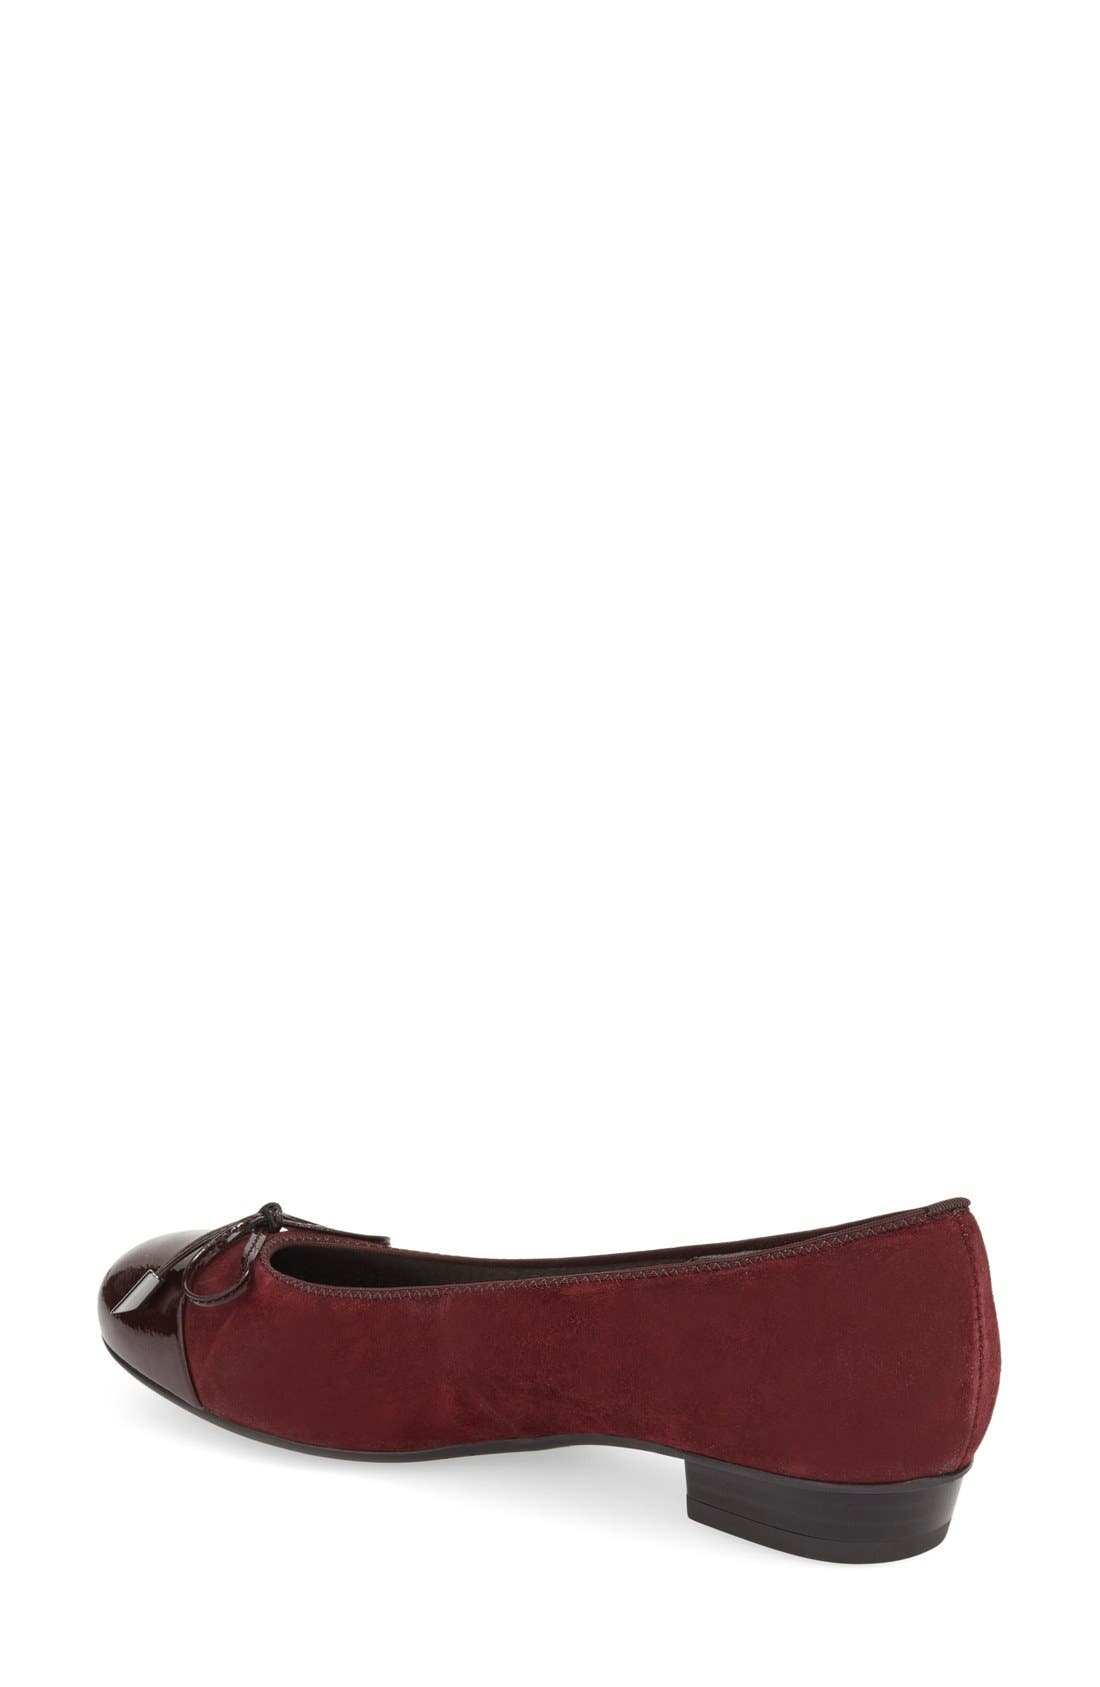 'Betty' Cap Toe Flat,                             Alternate thumbnail 2, color,                             Burgundy Patent Leather